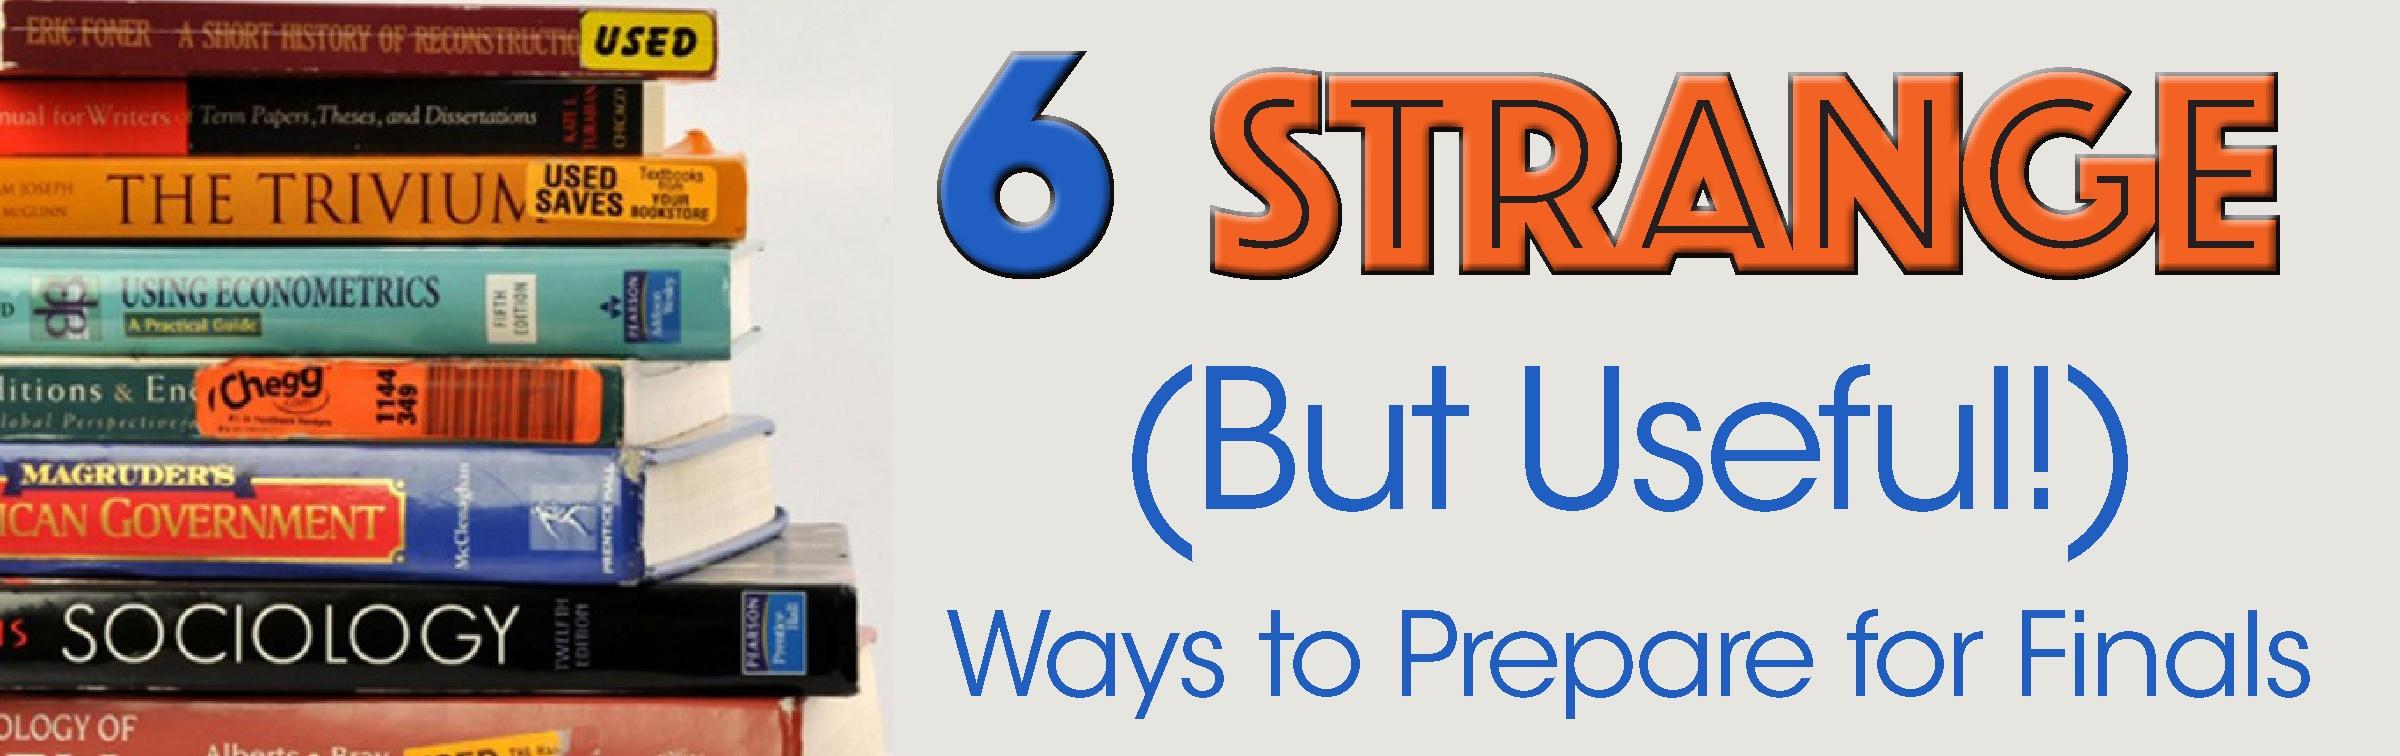 6 strange but useful ways to prepare for finals banner  jjc joliet junior college